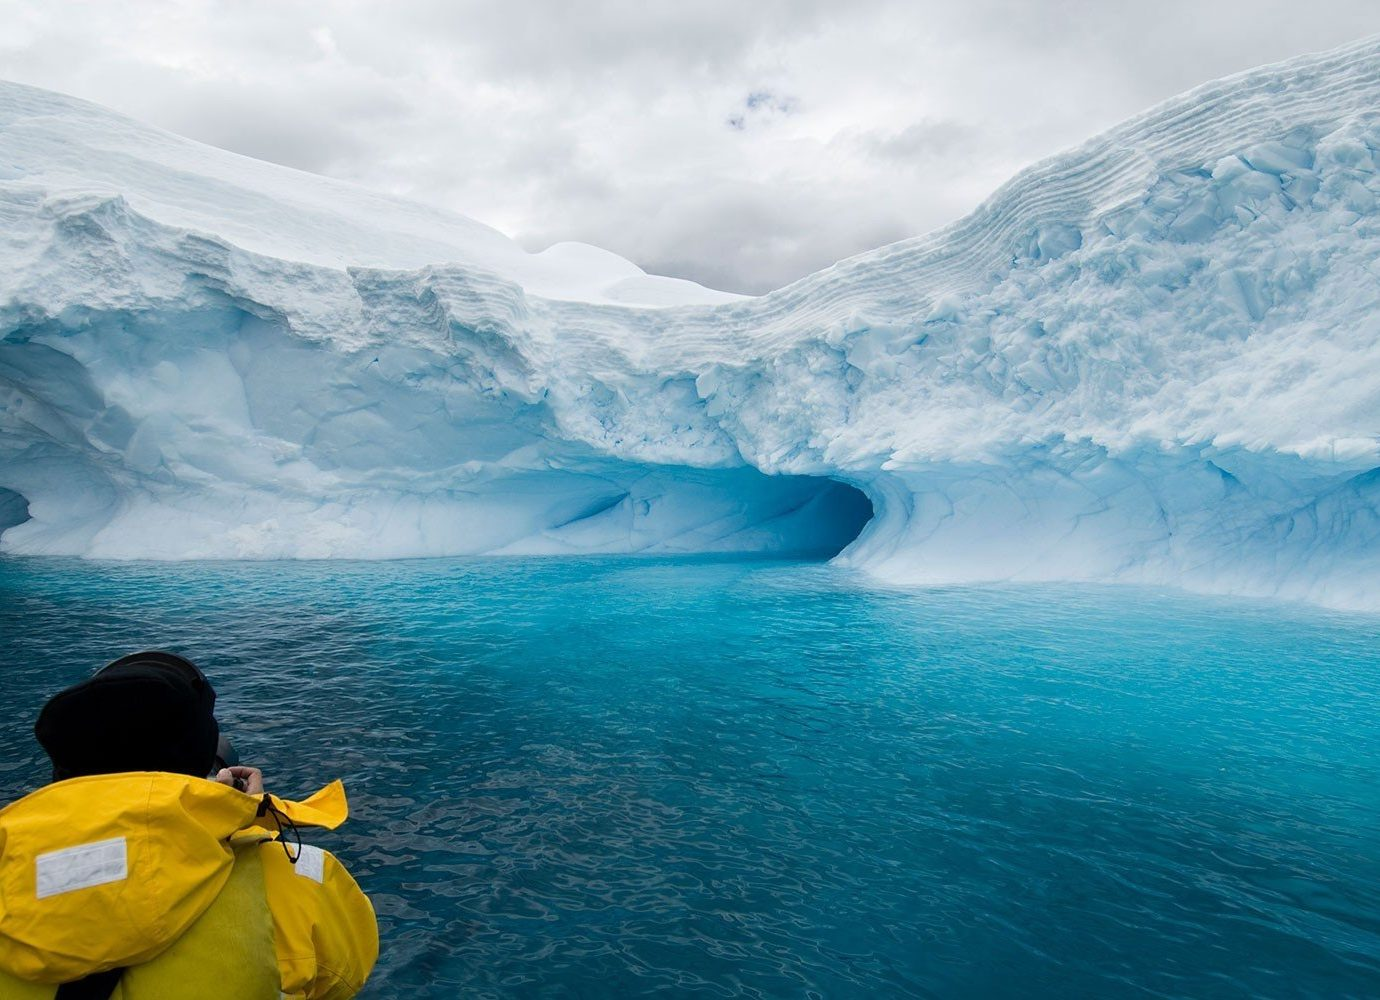 Trip Ideas water outdoor Nature iceberg mountain Ocean ice Sea wind wave arctic arctic ocean fjord wave yellow sea ice extreme sport glacial landform